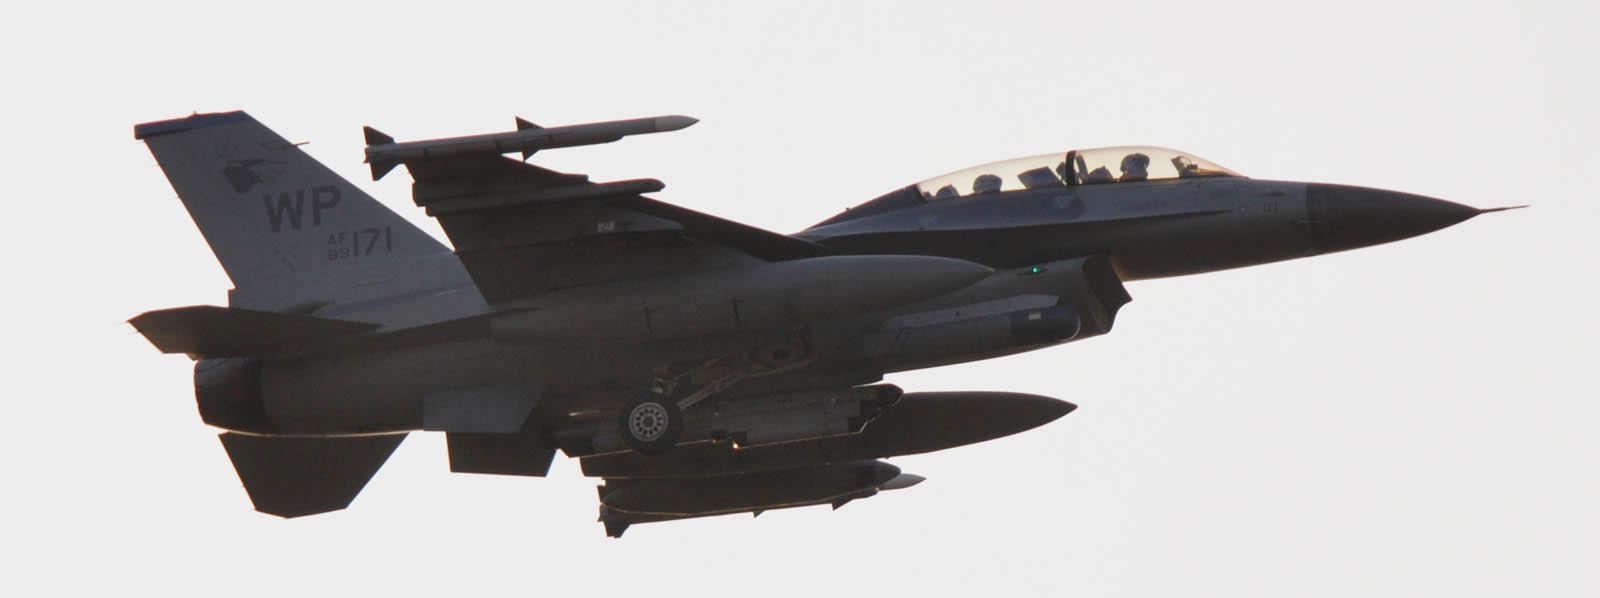 F16dg111218g215